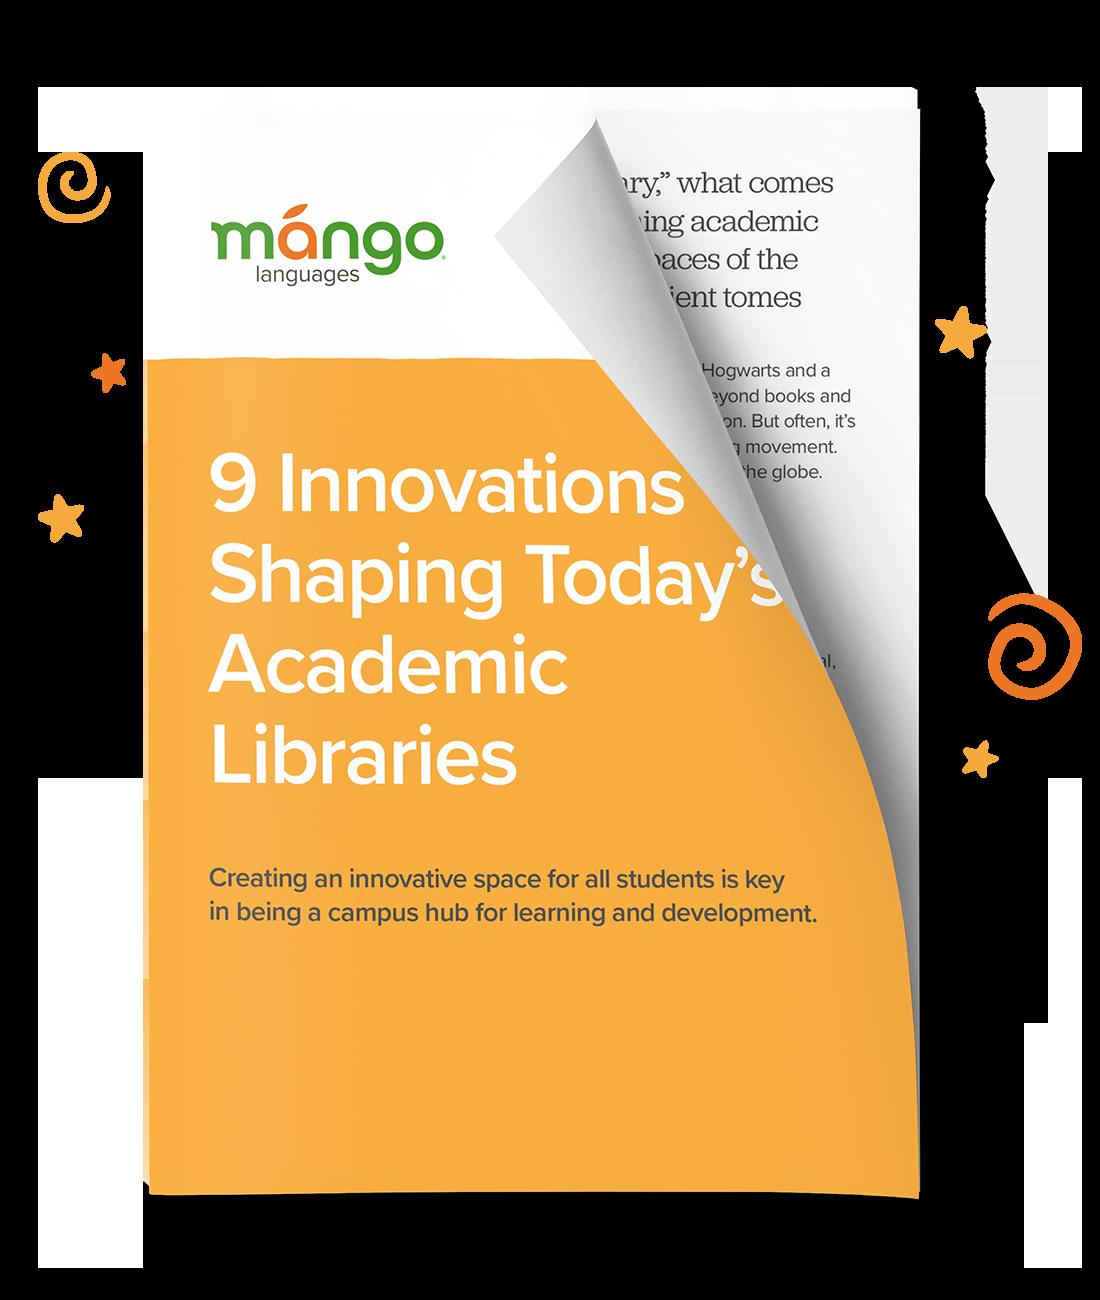 mango-inbound-9-innovations